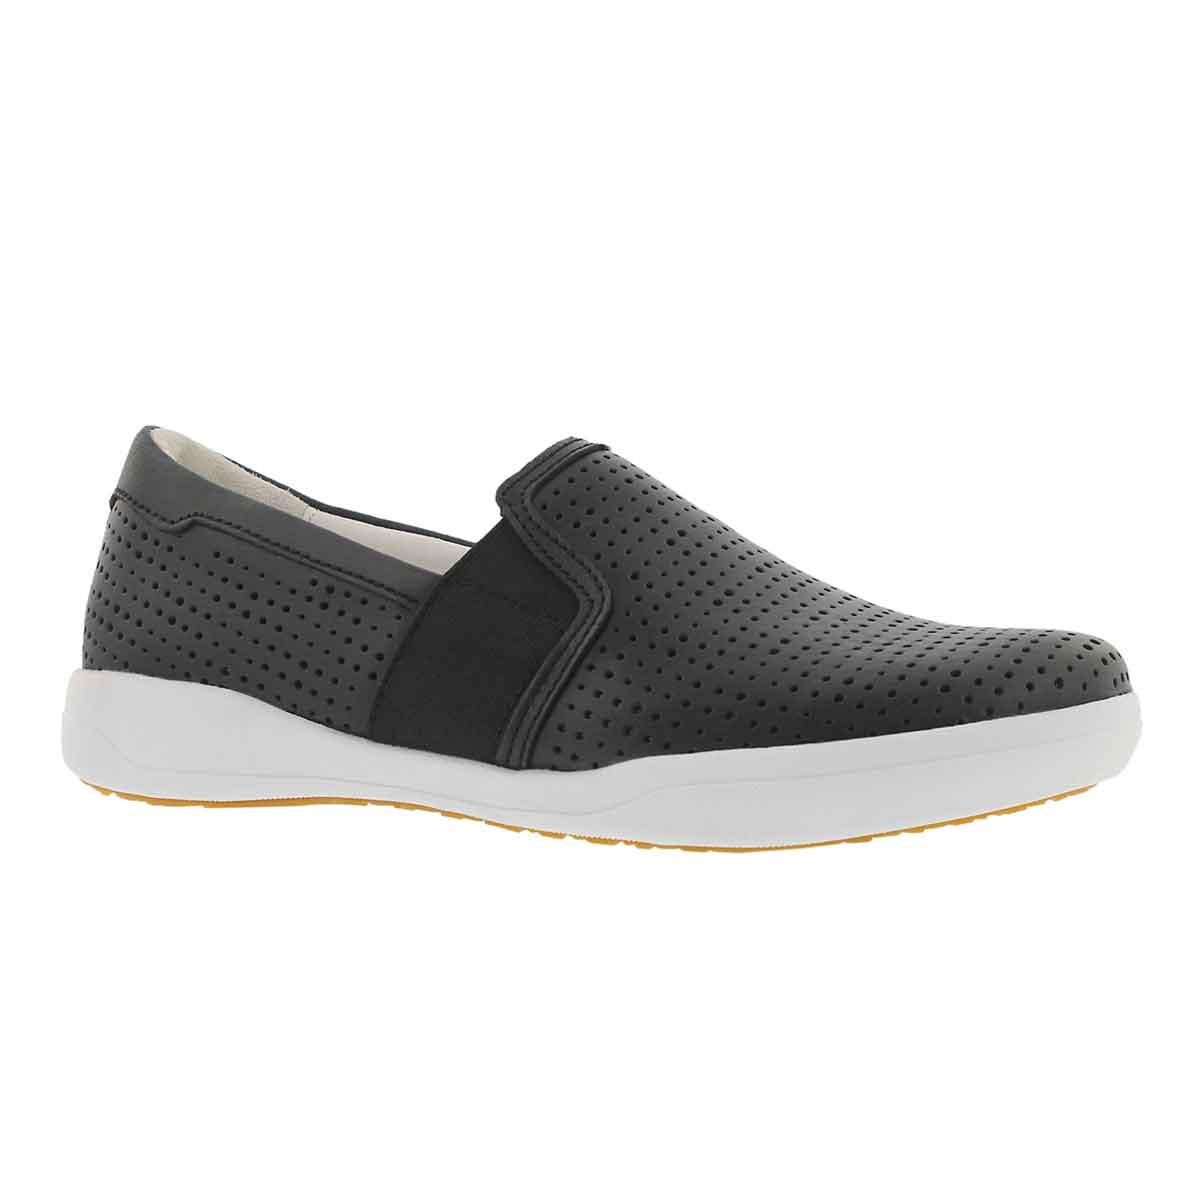 Lds Sina 33 black slip on shoe